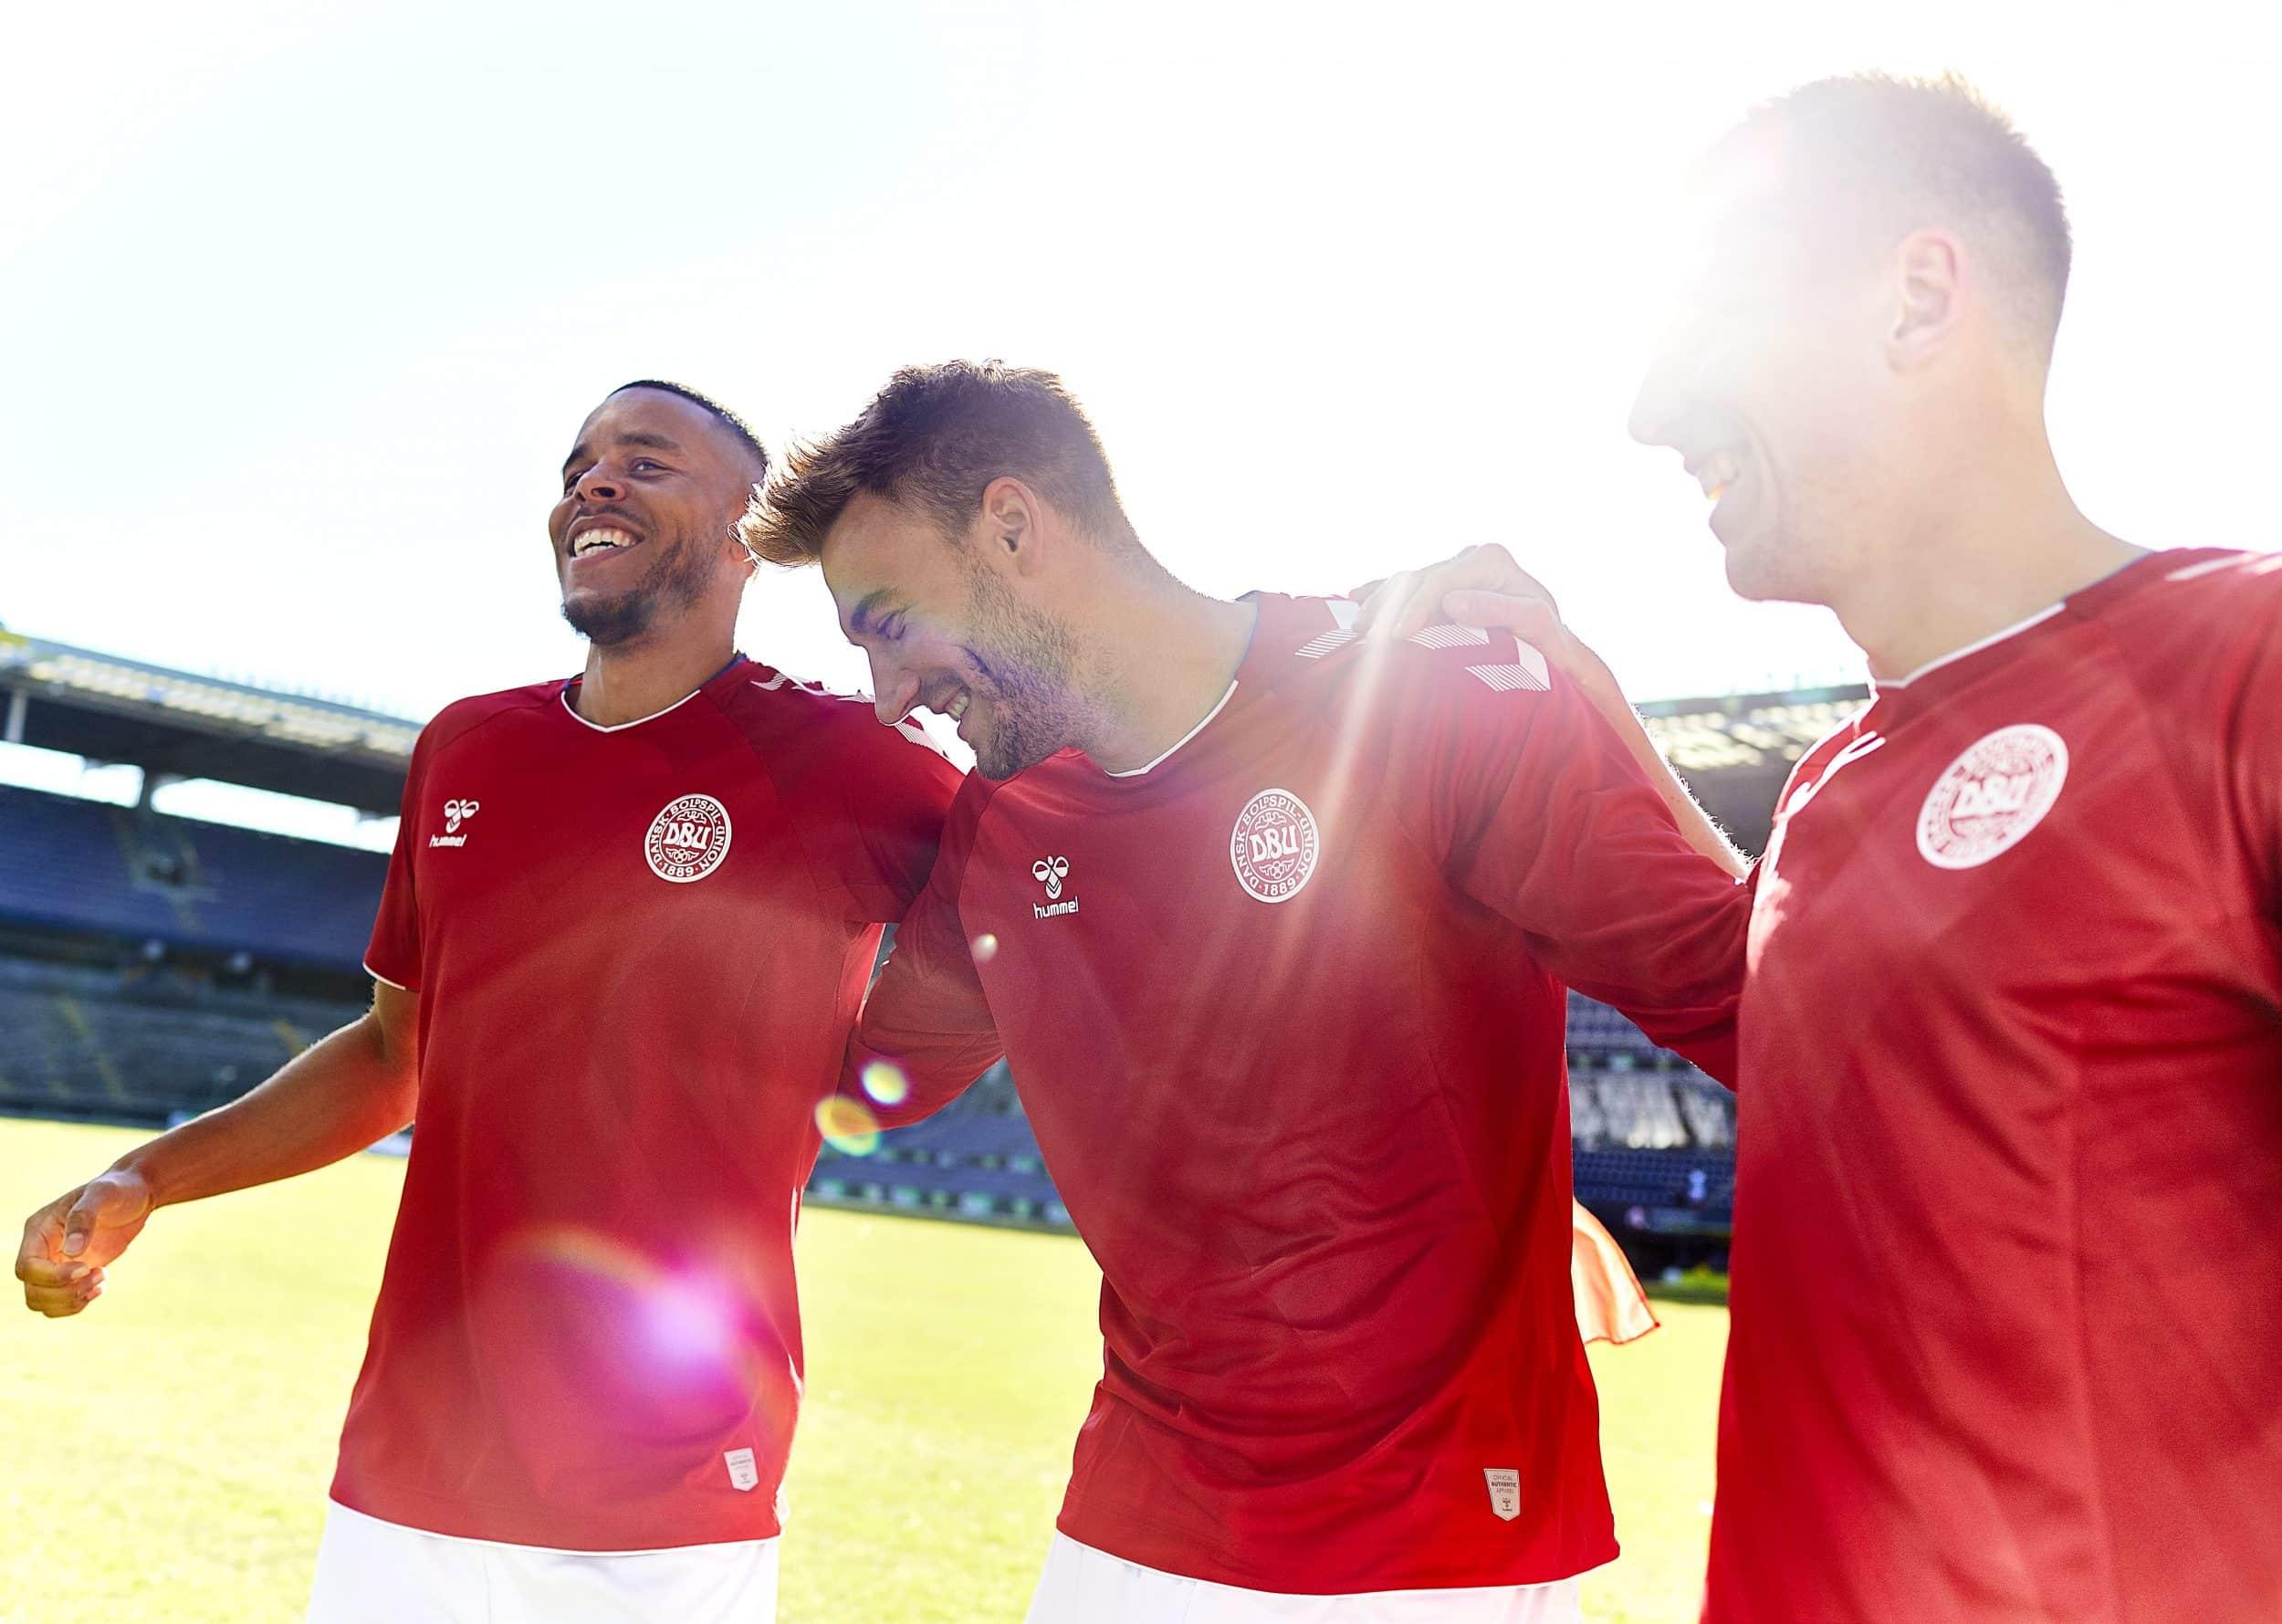 maillot-football-selection-danemark-coupe-du-monde-2018-4